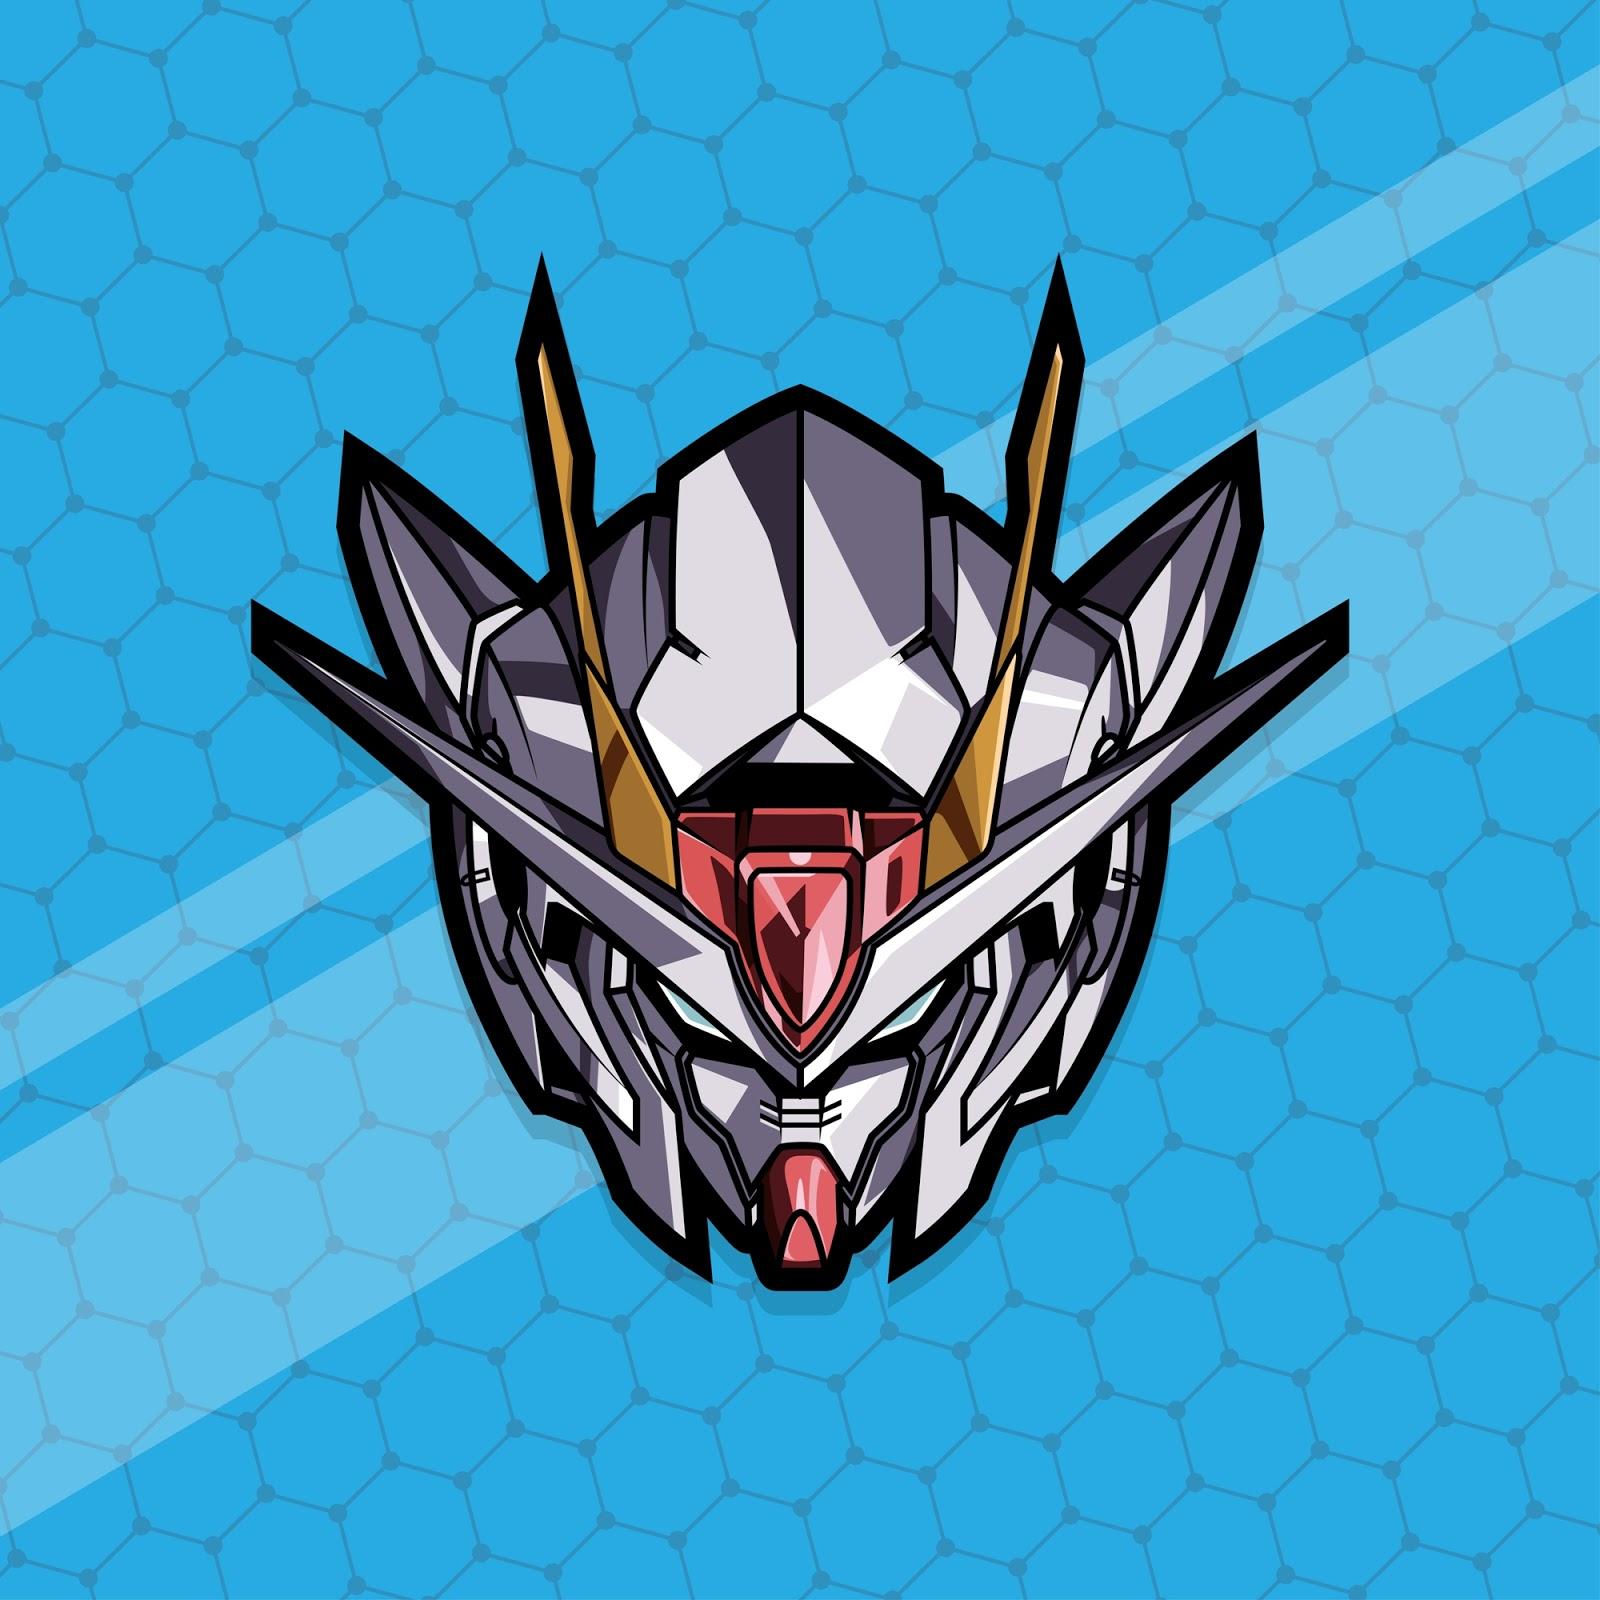 Esport Gamer Logo Gundam Free Download Vector CDR, AI, EPS and PNG Formats